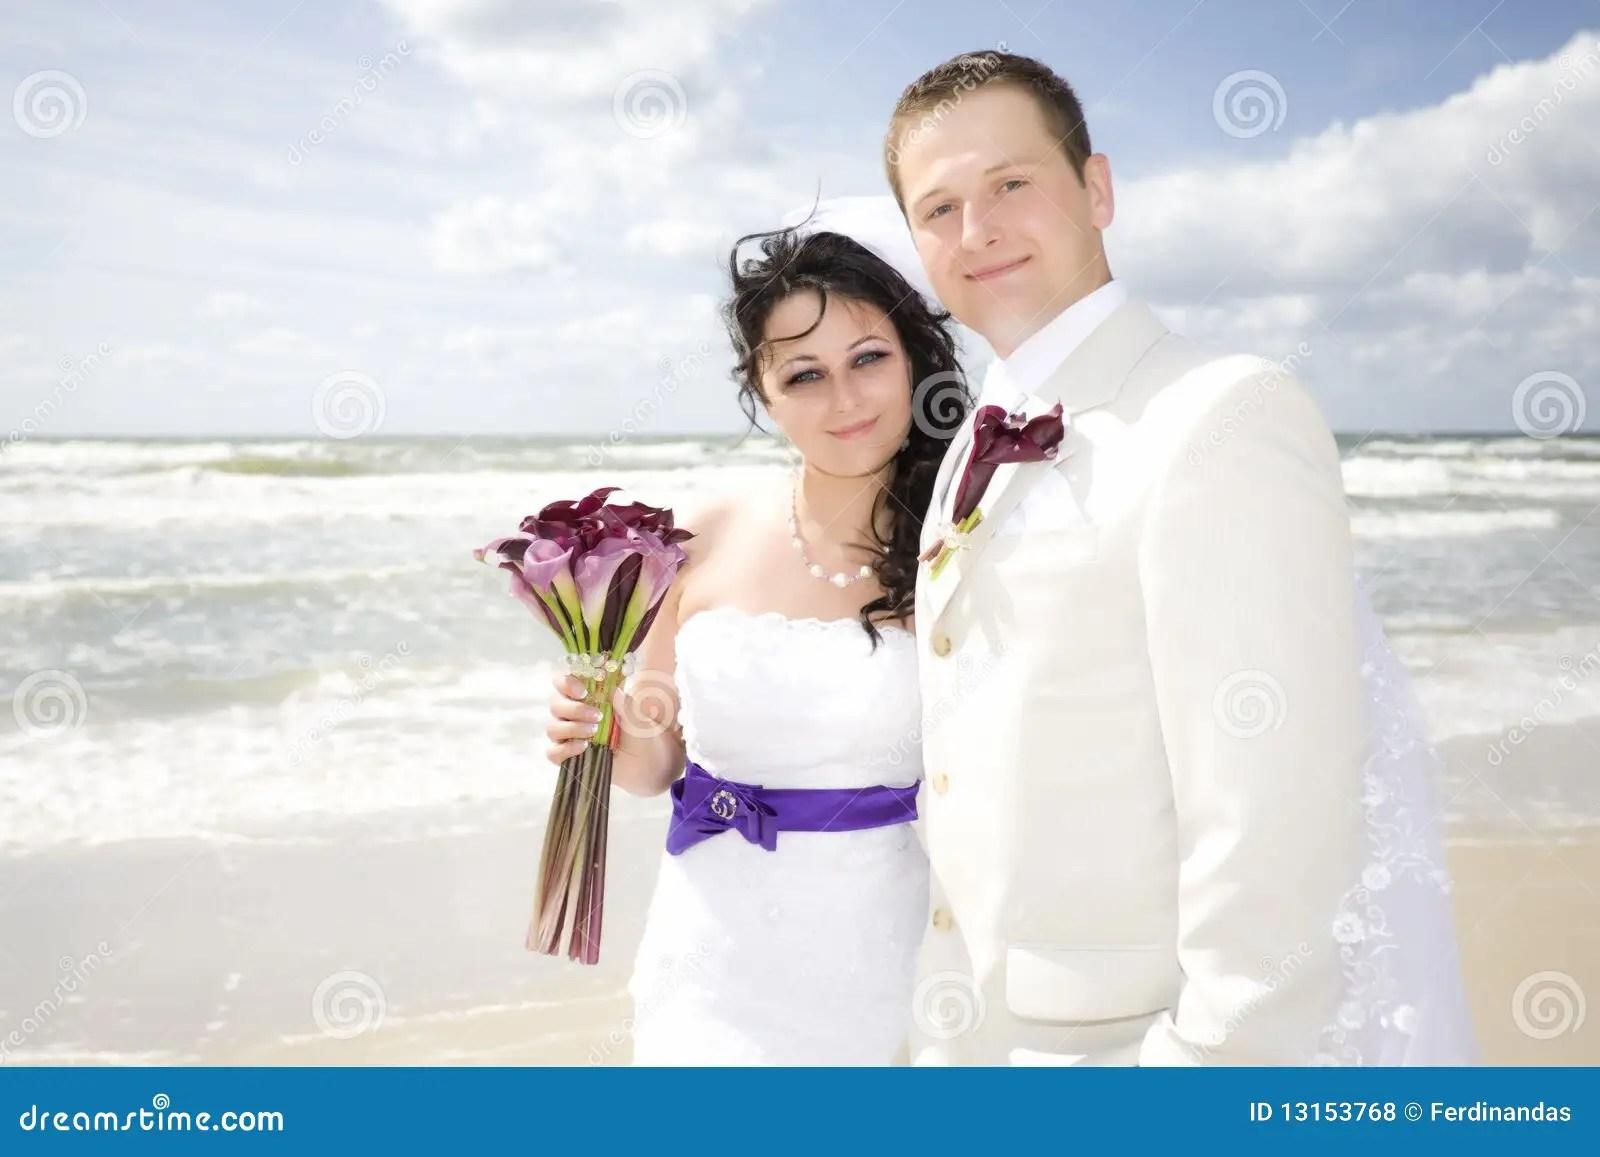 Happy Wedding Couple High Key Seashore Stock Photo